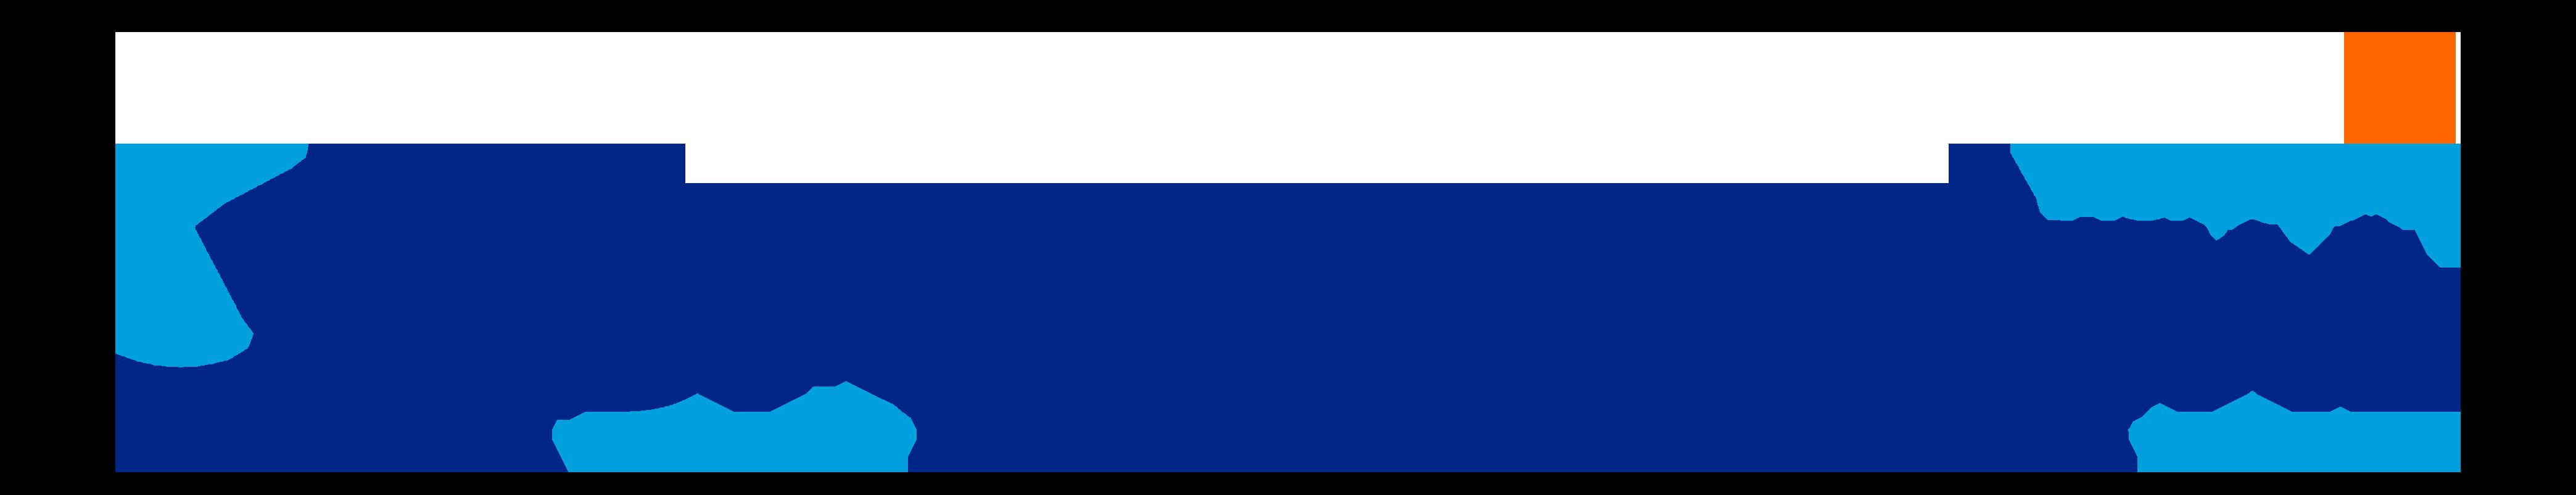 Dforce academy Logo